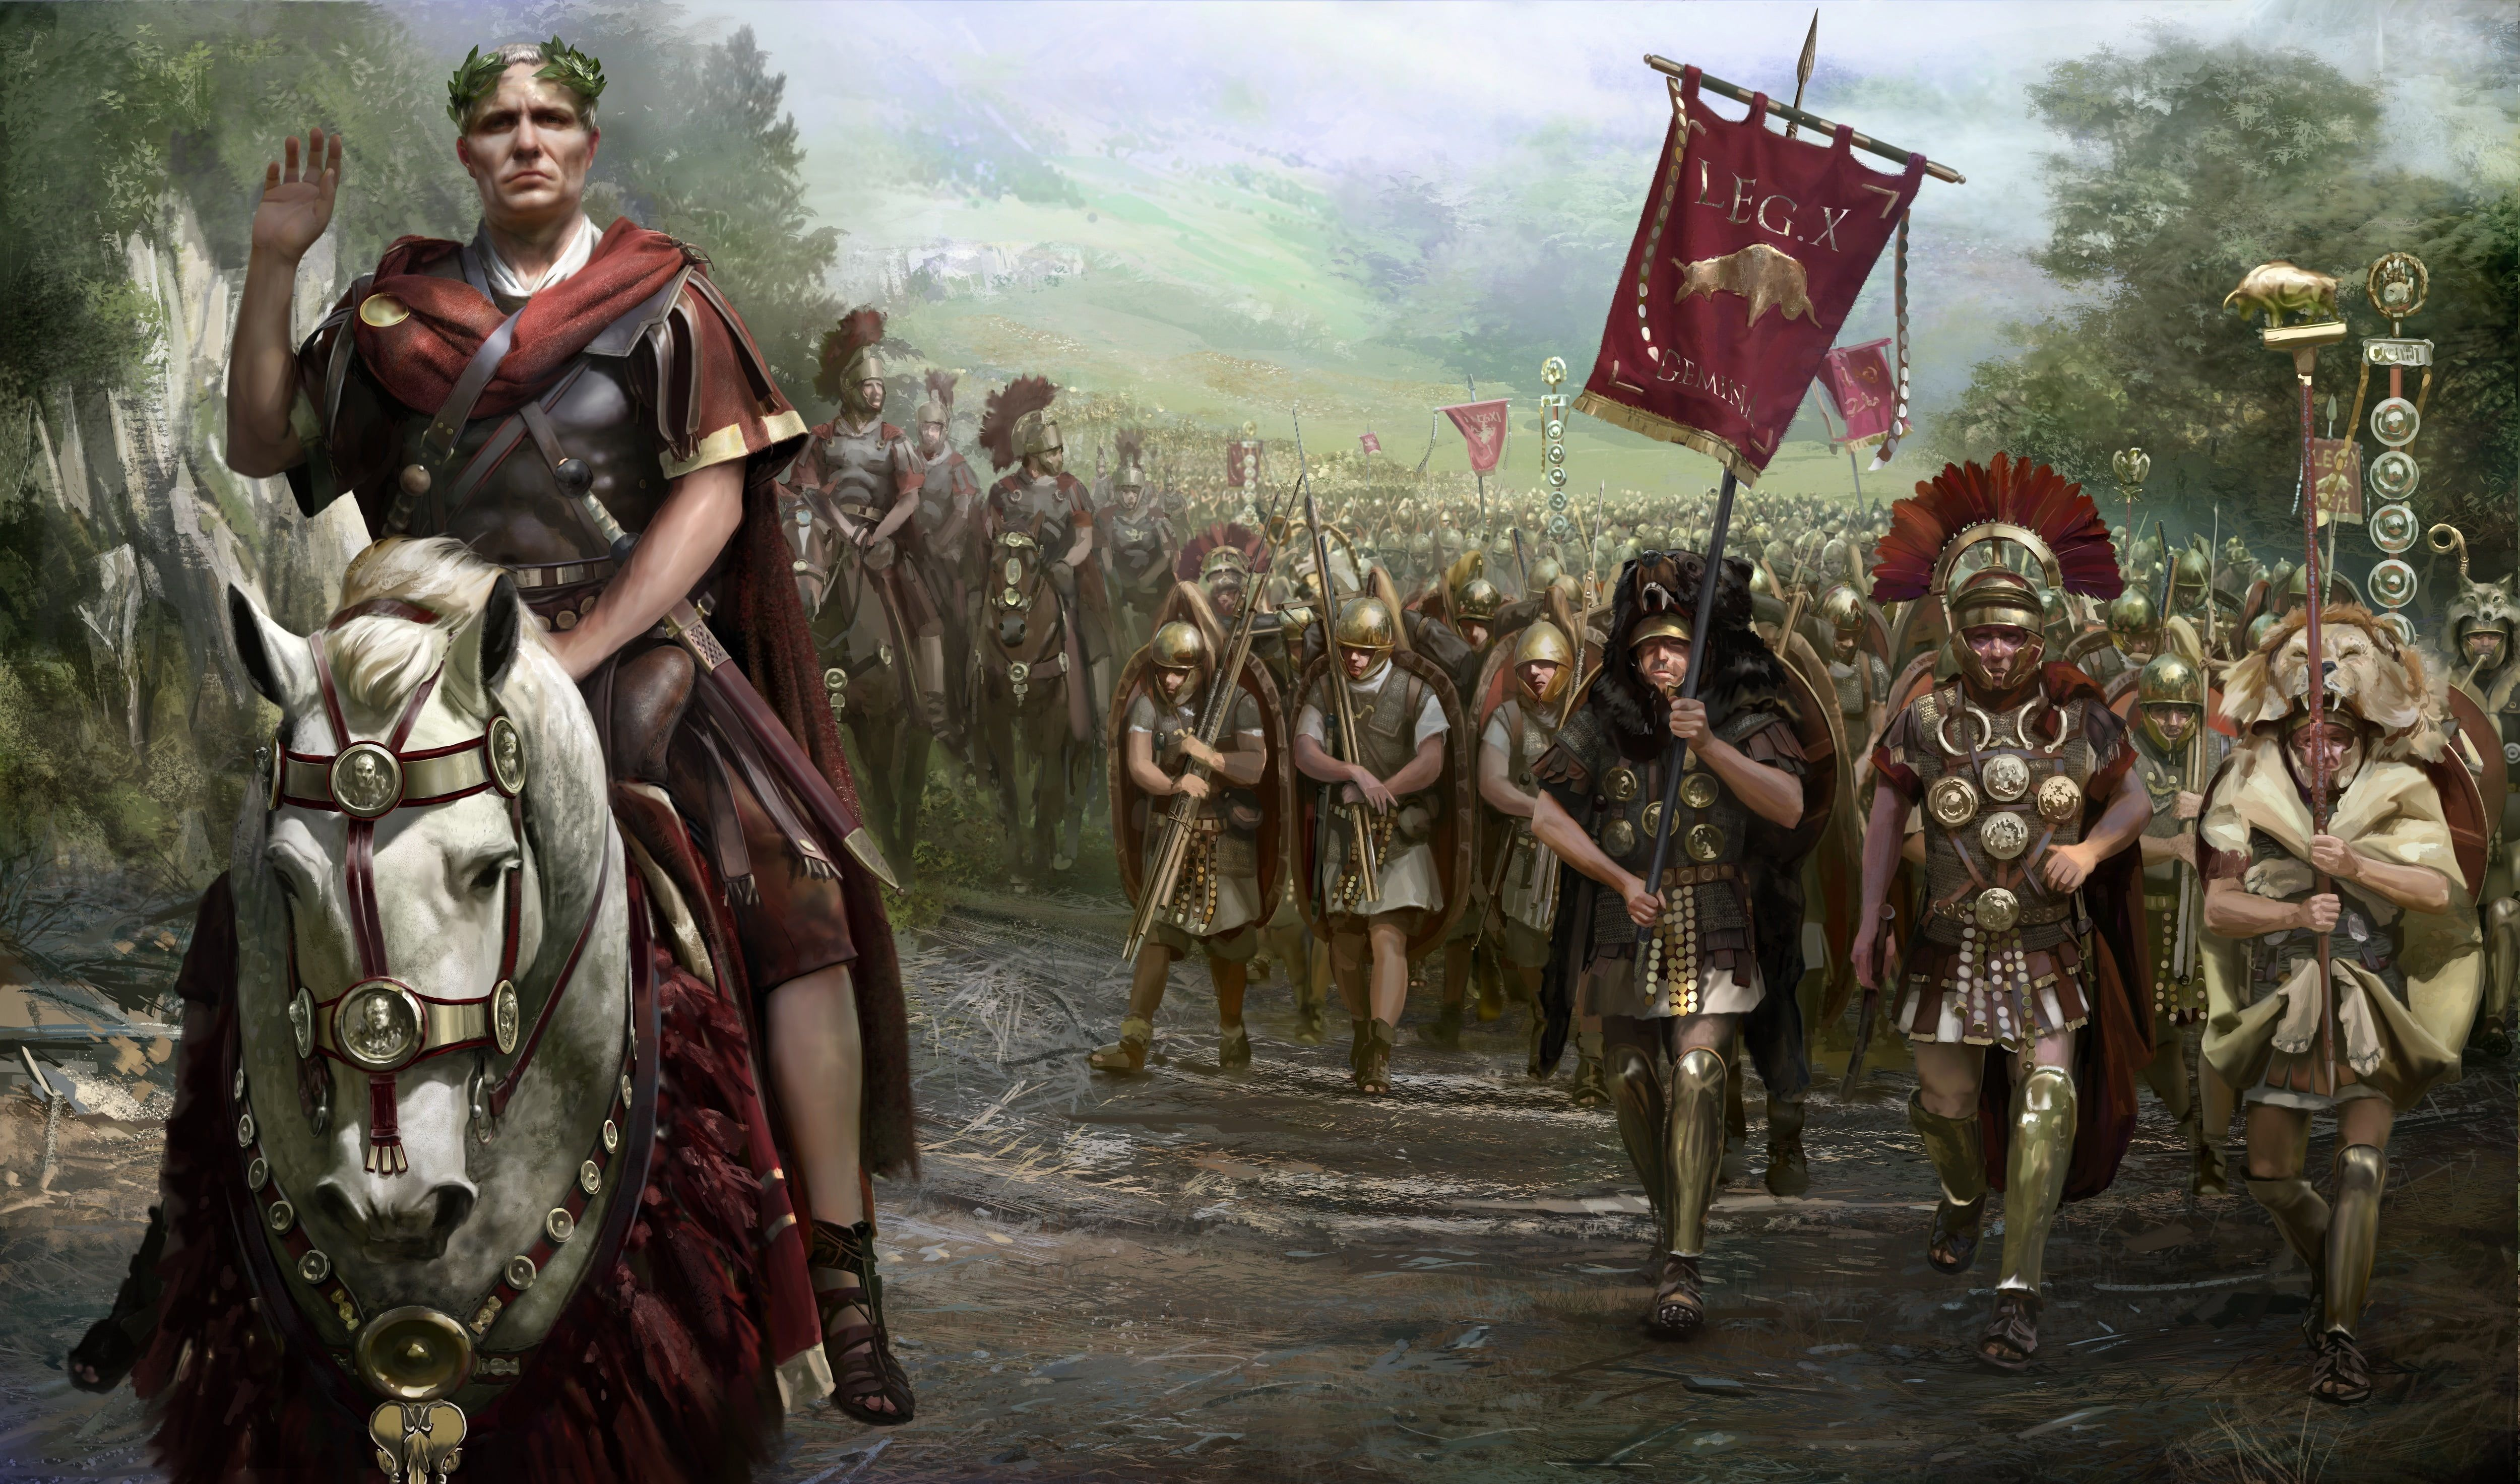 Roman Empire Wallpaper Total War Army Background Legion Dlc Legionnaires Video Game Infantry Total War Rom Roman Empire Ancient Warfare Empire Wallpaper